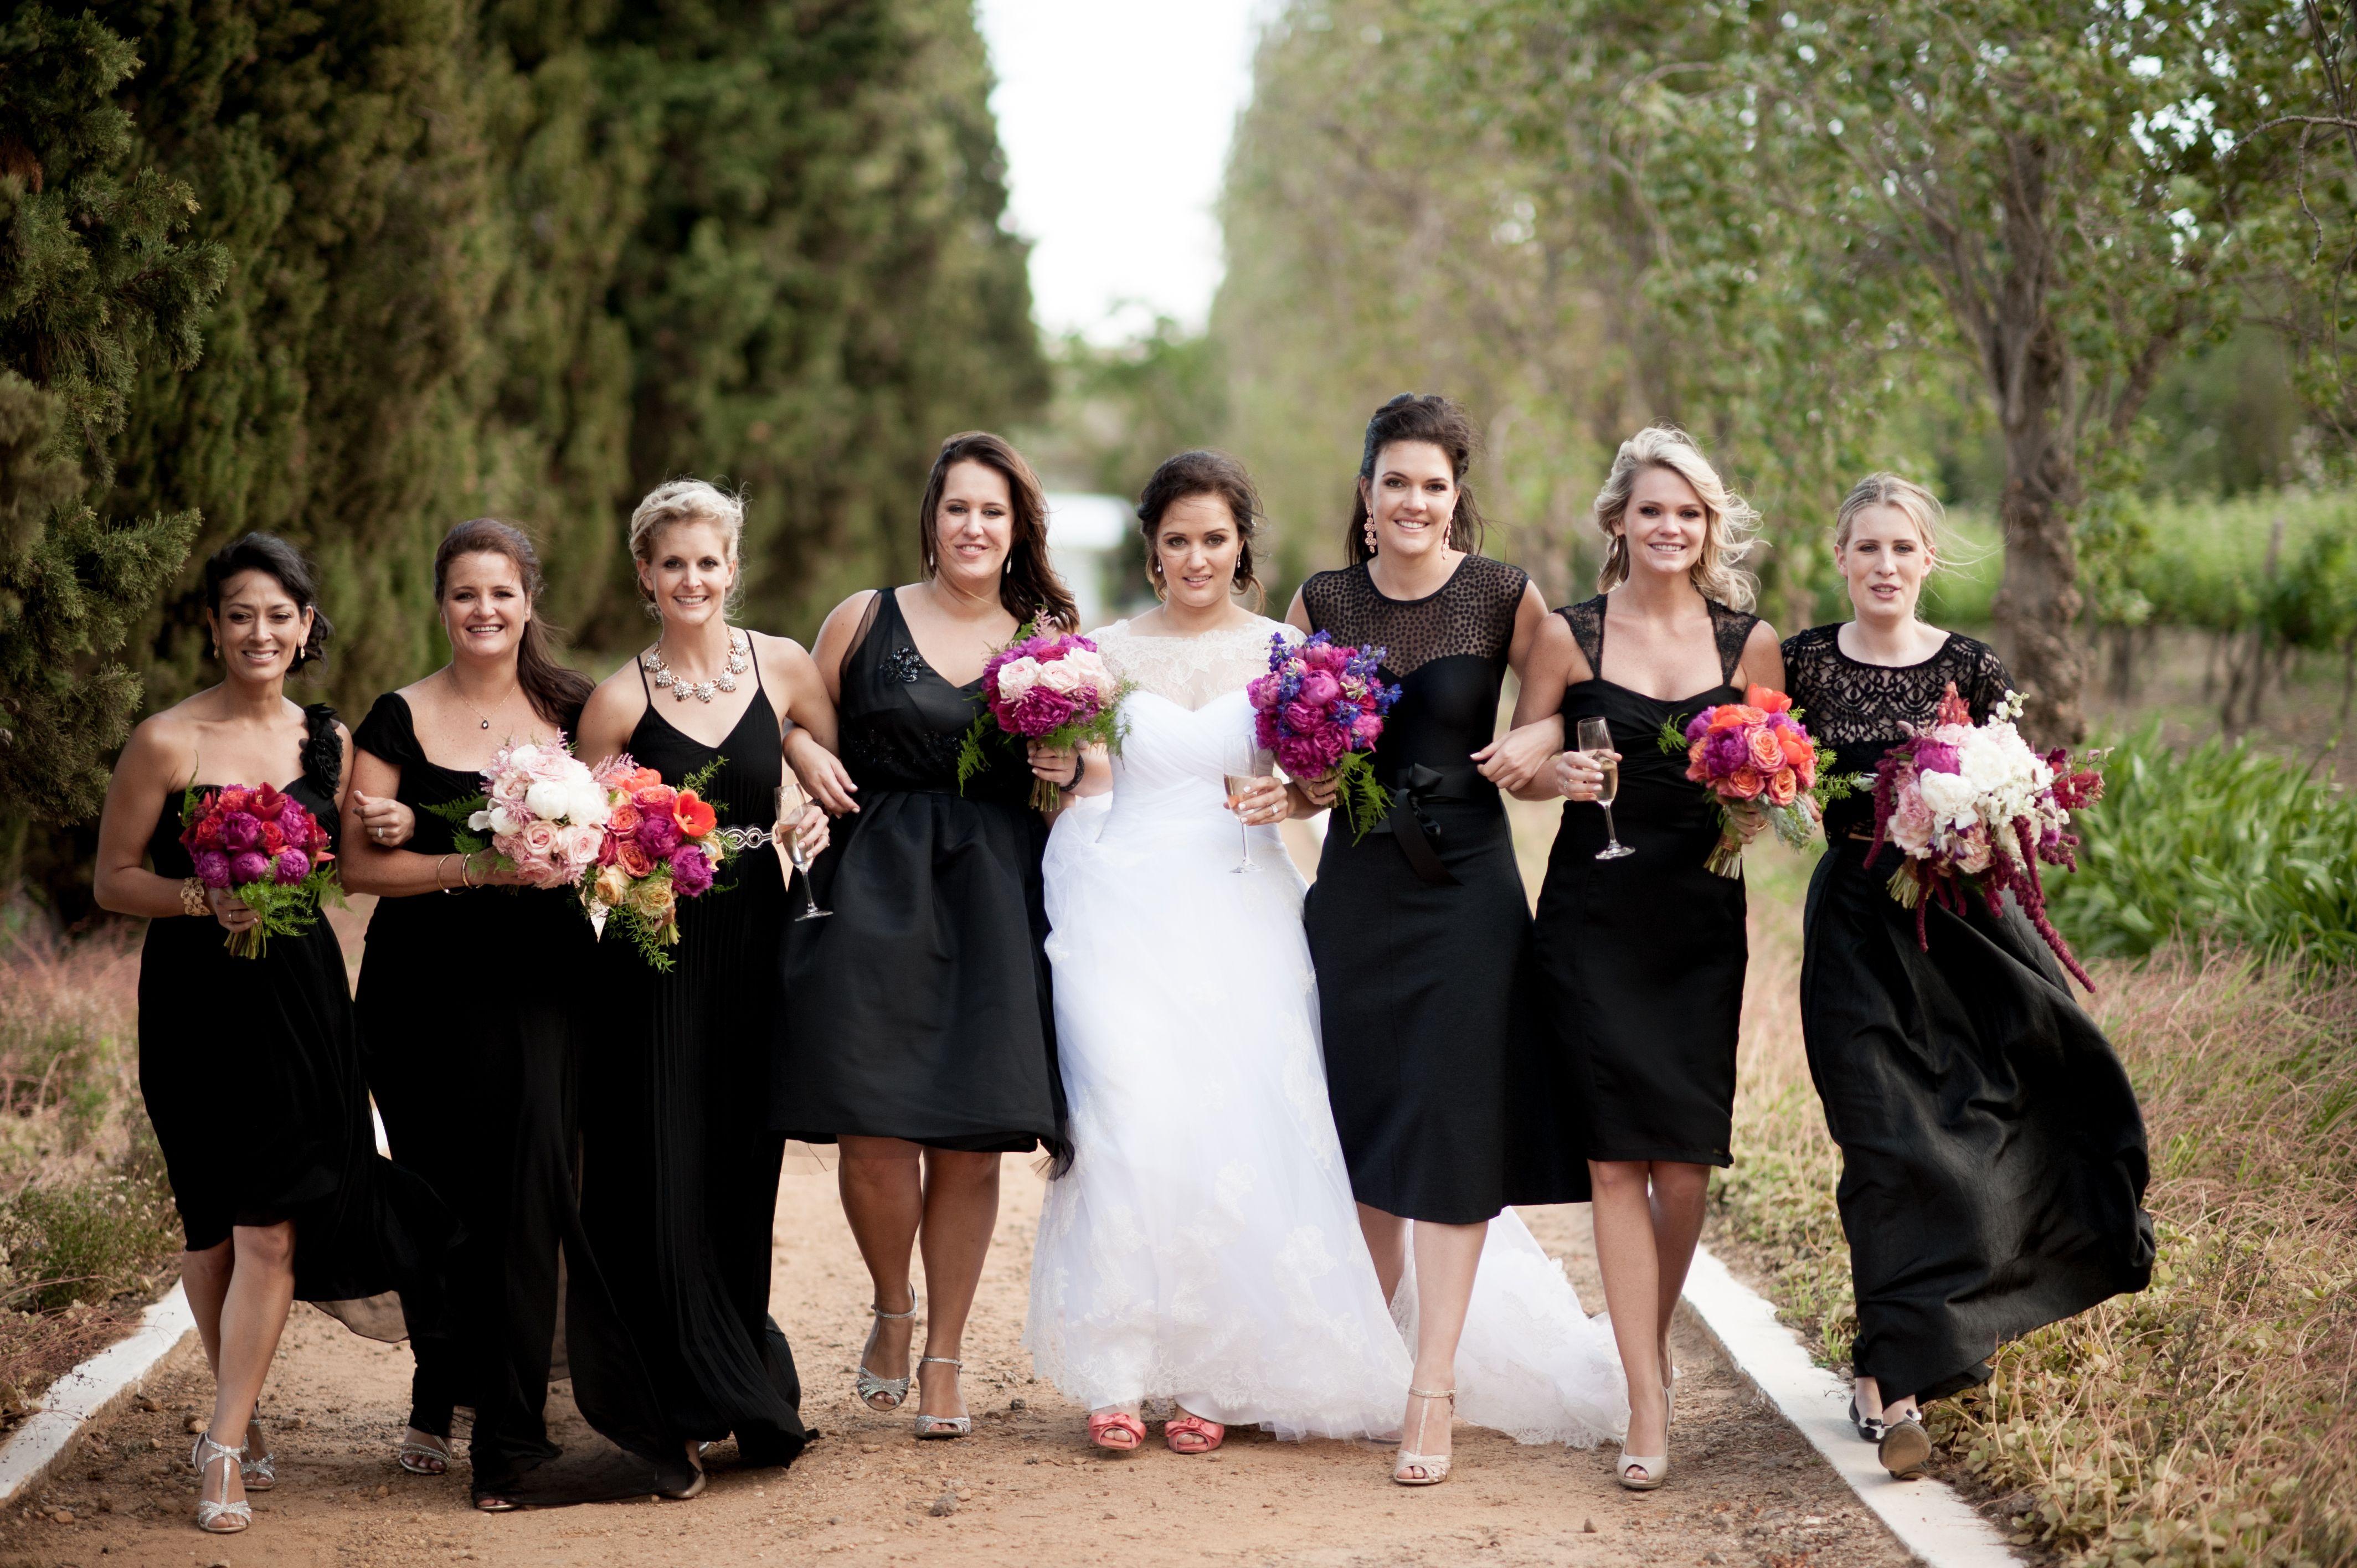 Bohemian wedding black bridesmaid dresses jewel tone wedding bohemian wedding black bridesmaid dresses jewel tone wedding black tie wedding image ombrellifo Images